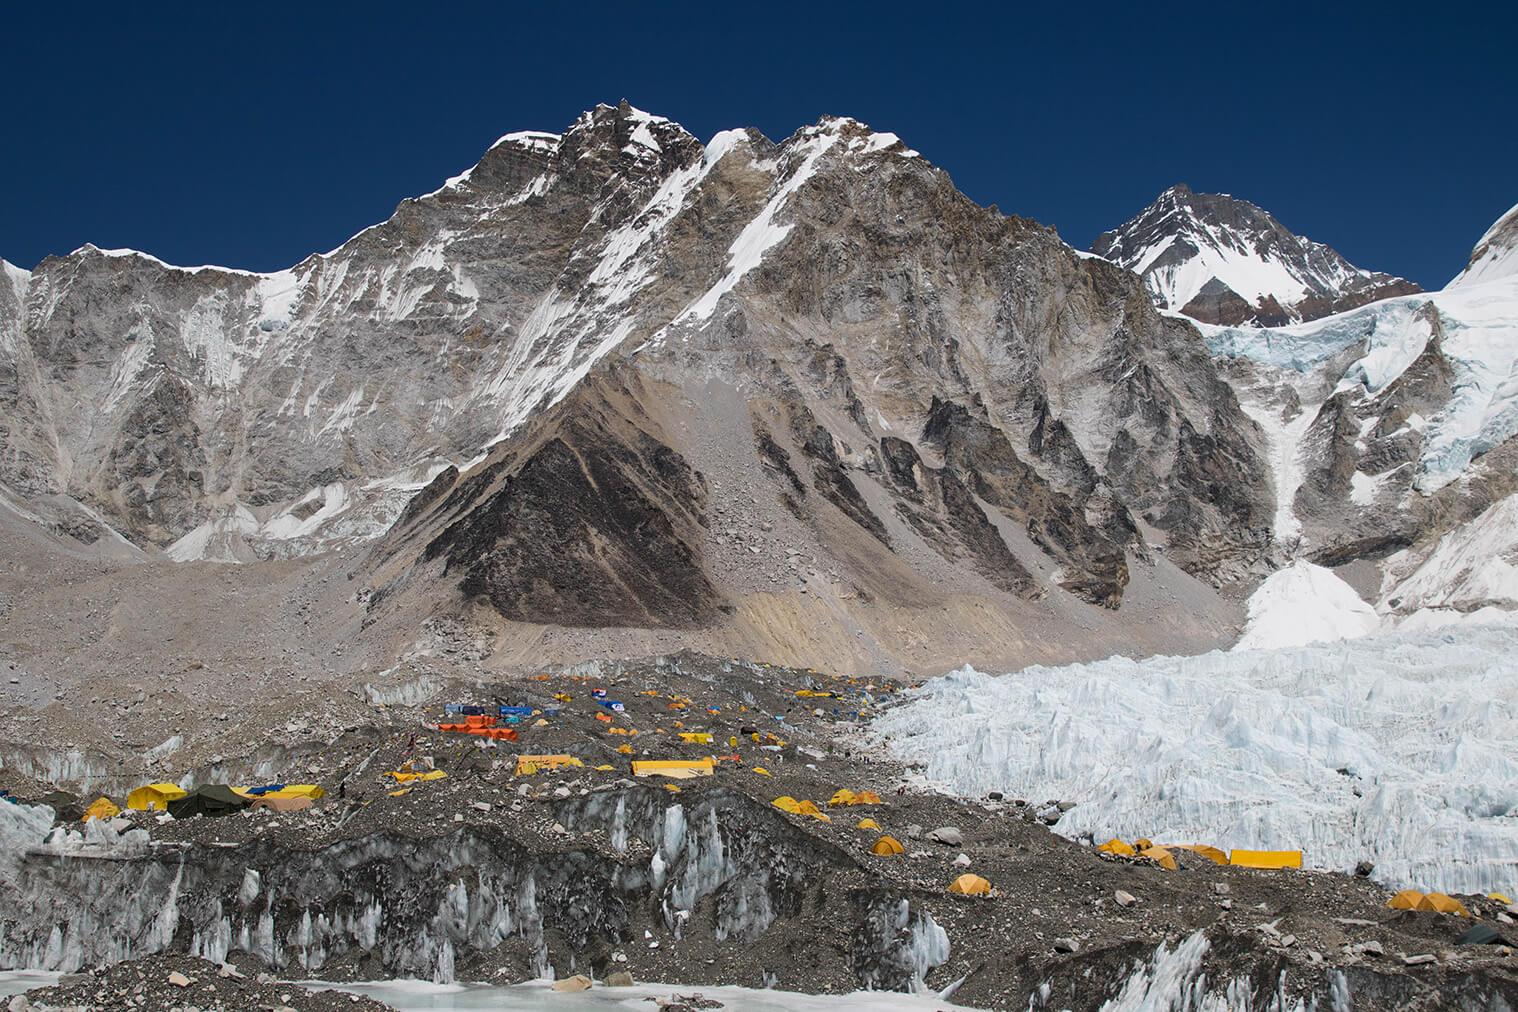 Base Camp (5360 m)